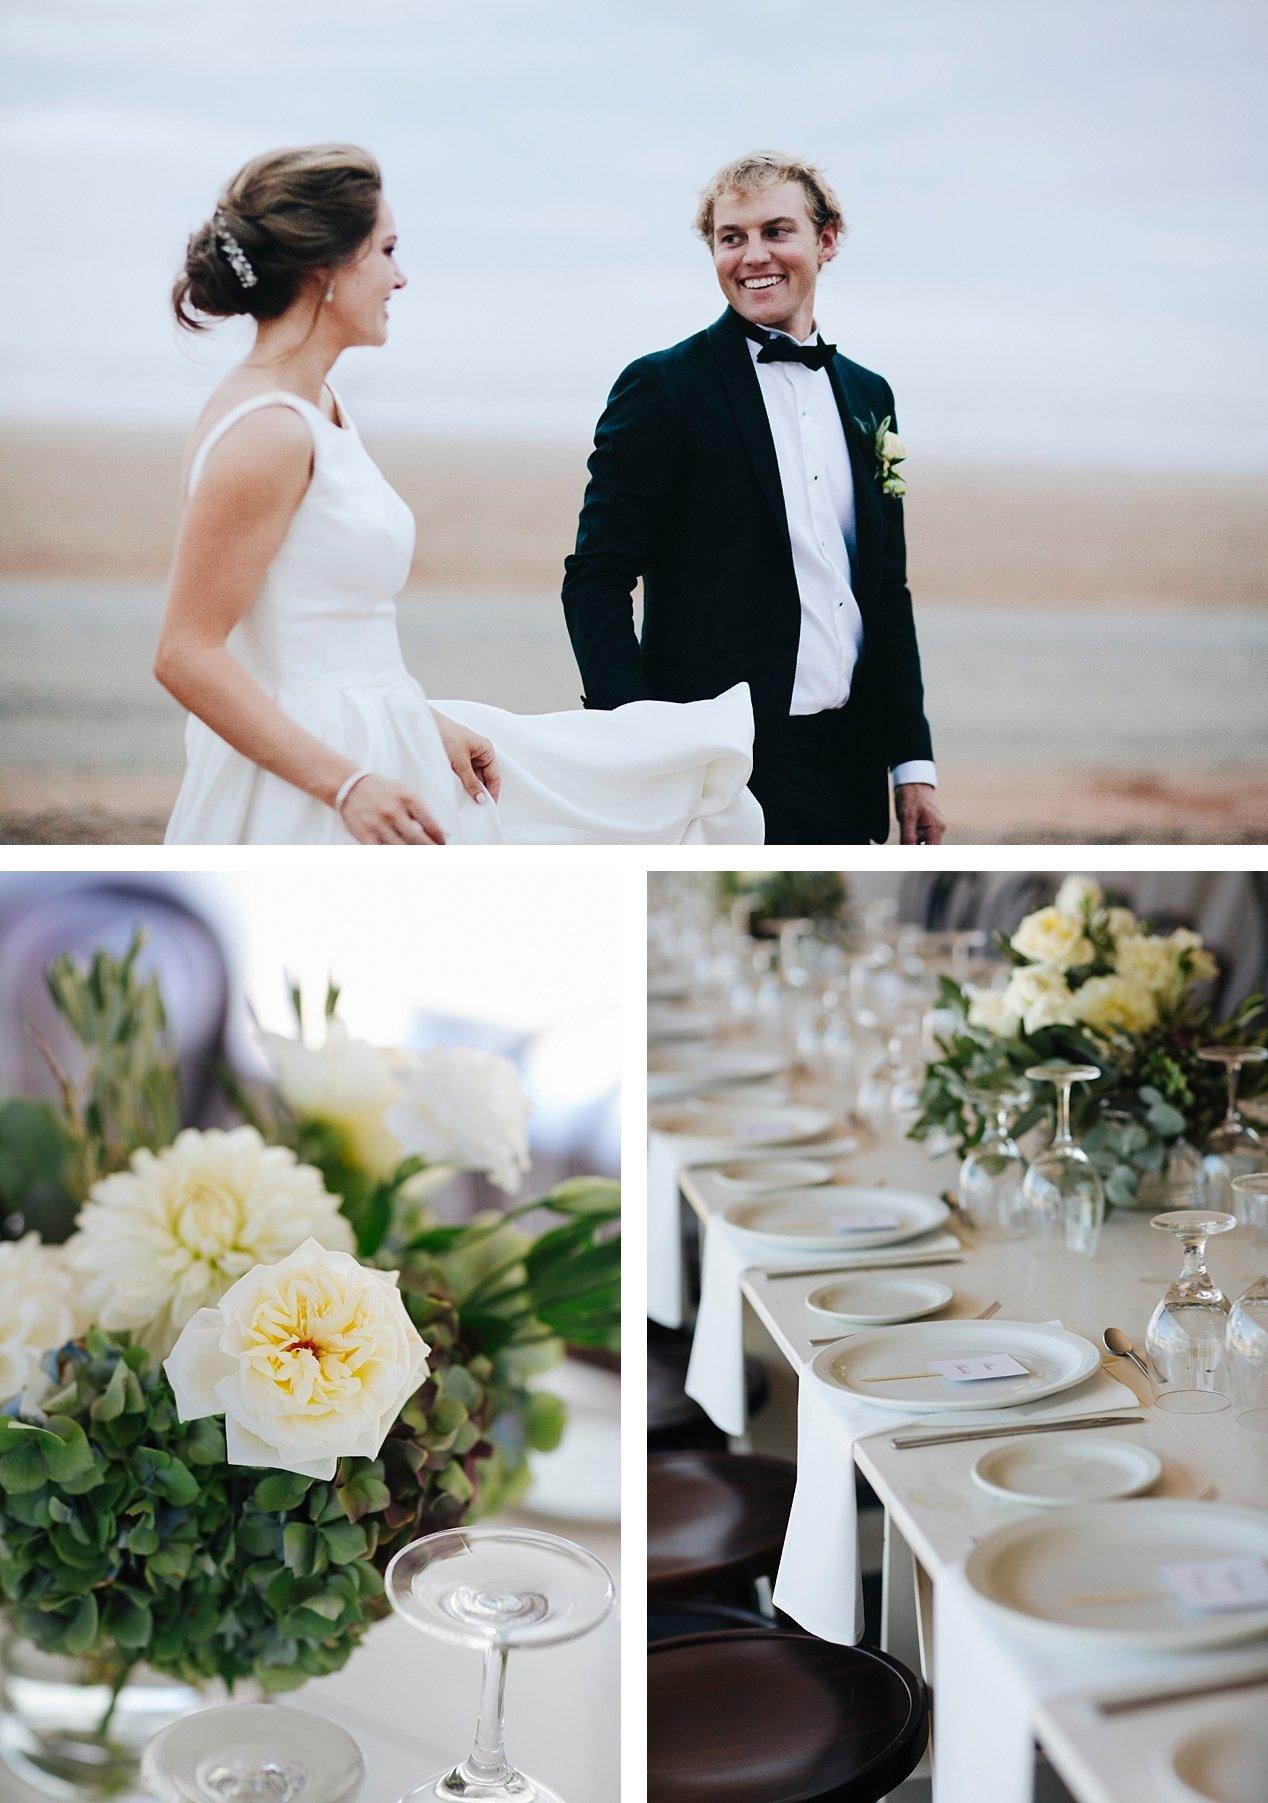 Jerilderie Wedding by Wagga Wagga Wedding Photographer Peppermint Studios_Deniliquin weddings_0071